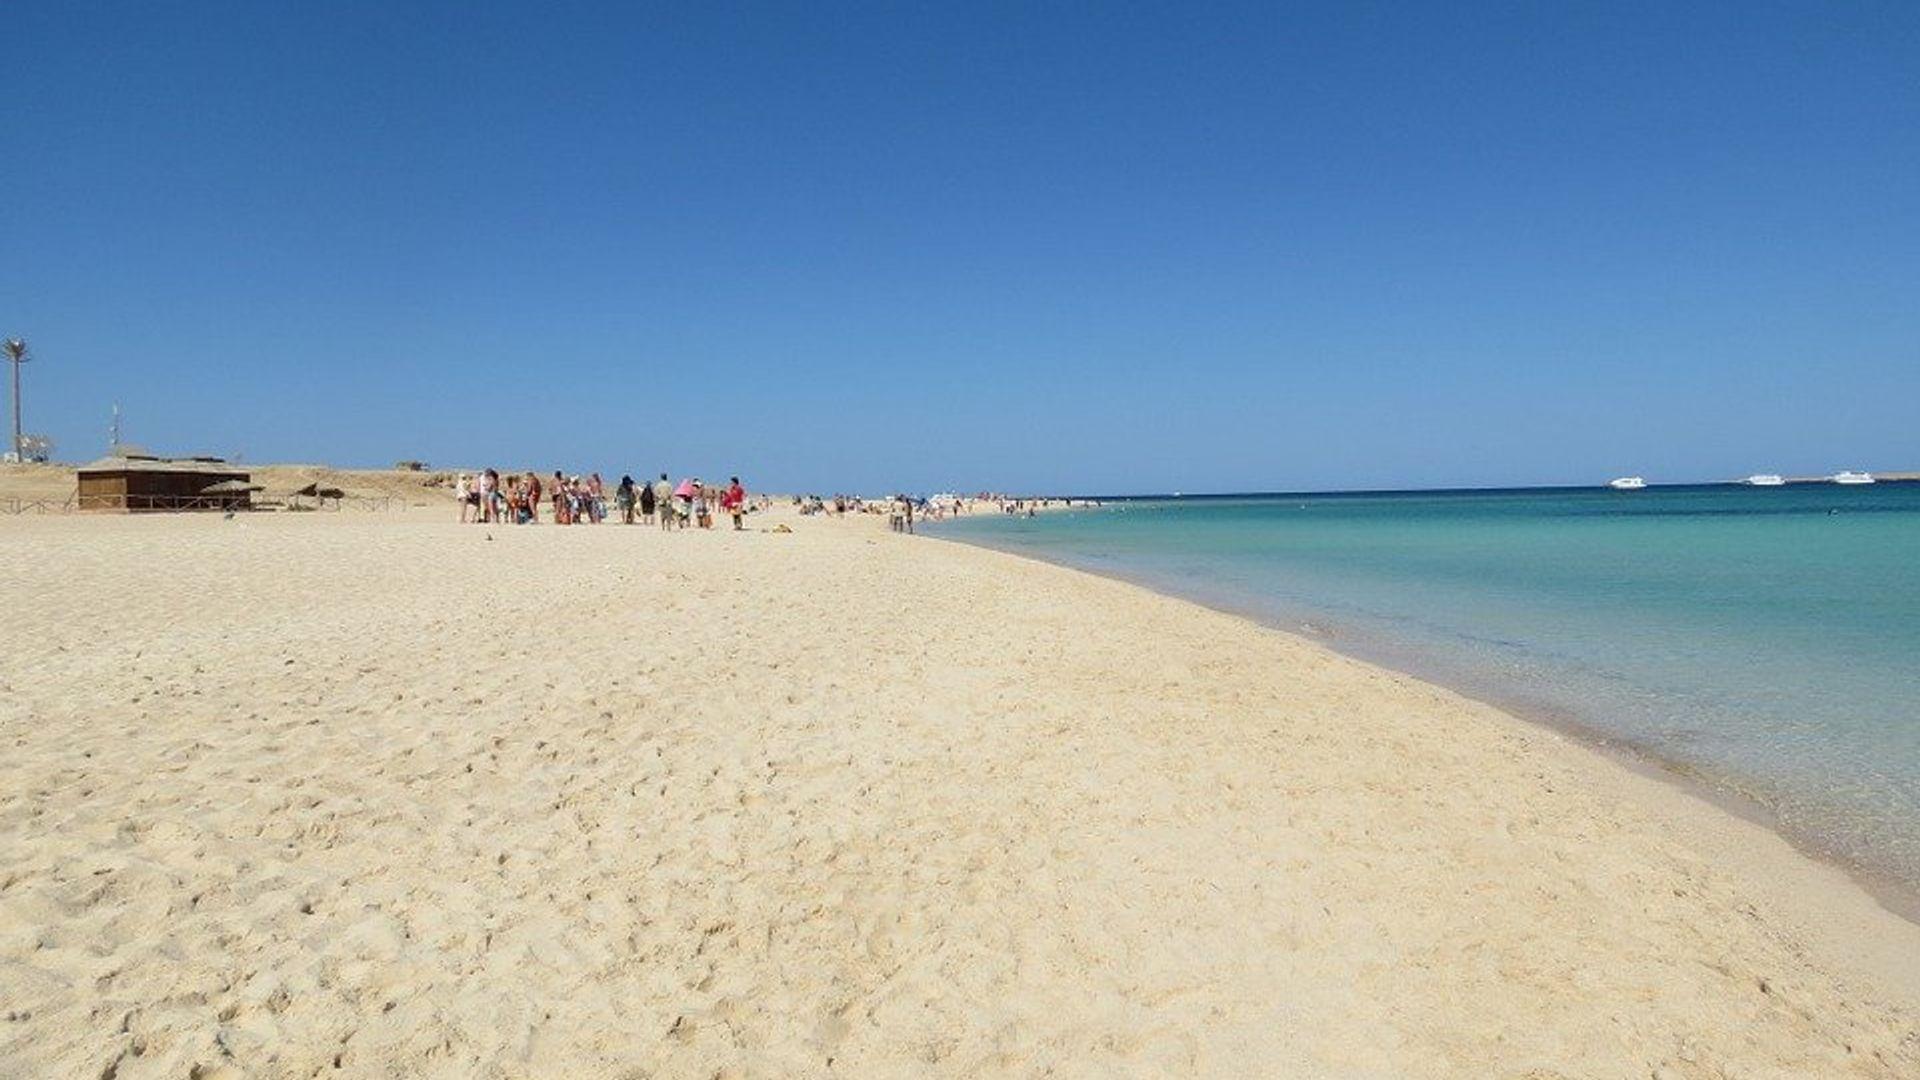 Craciun 2021 - Sejur plaja Hurghada, Egipt, 8 zile - zbor charter